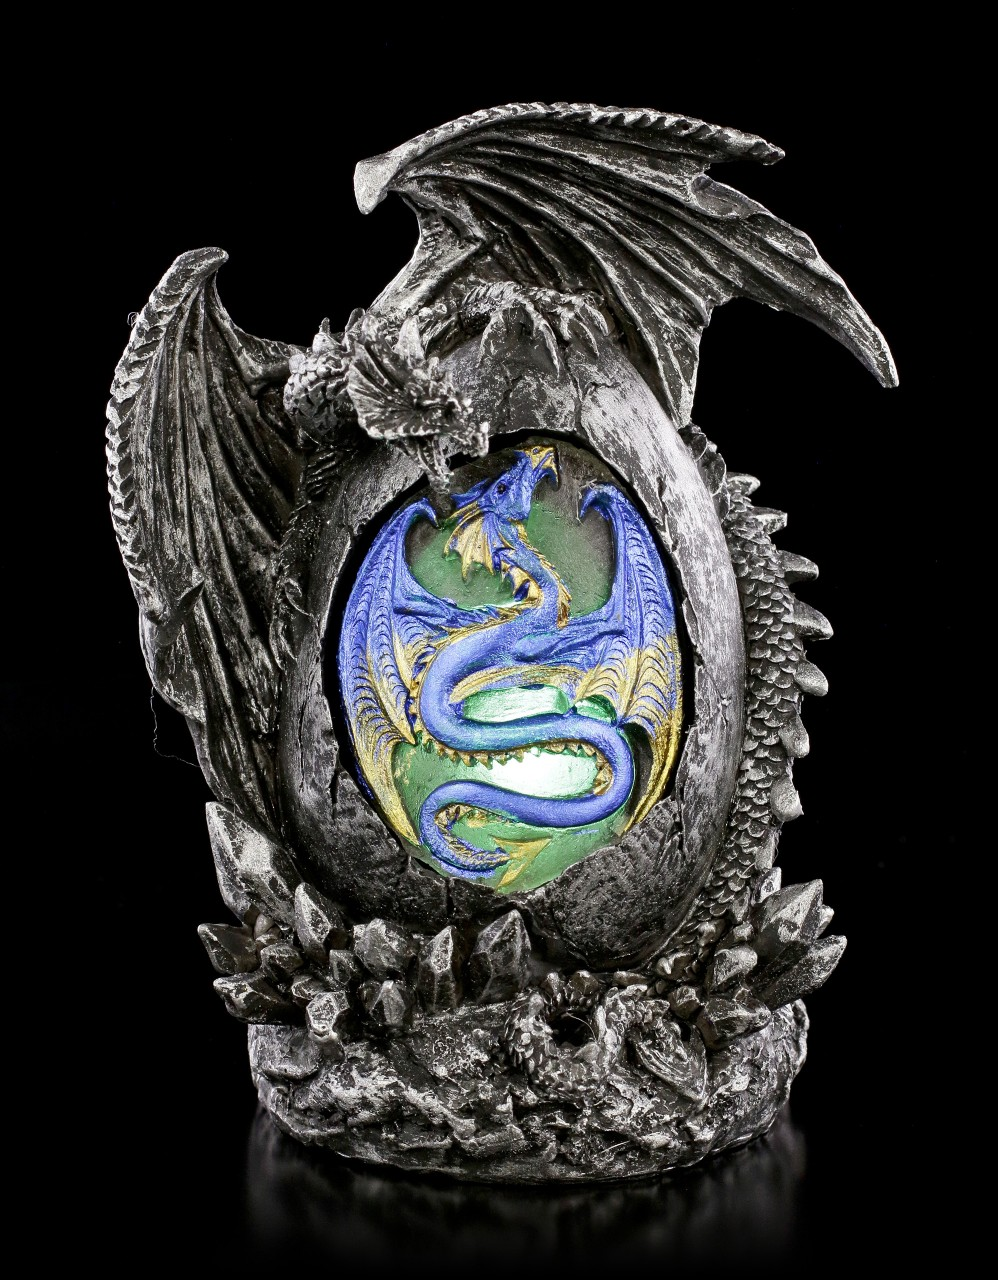 Dragon Figurine - Sehab on Egg with LED